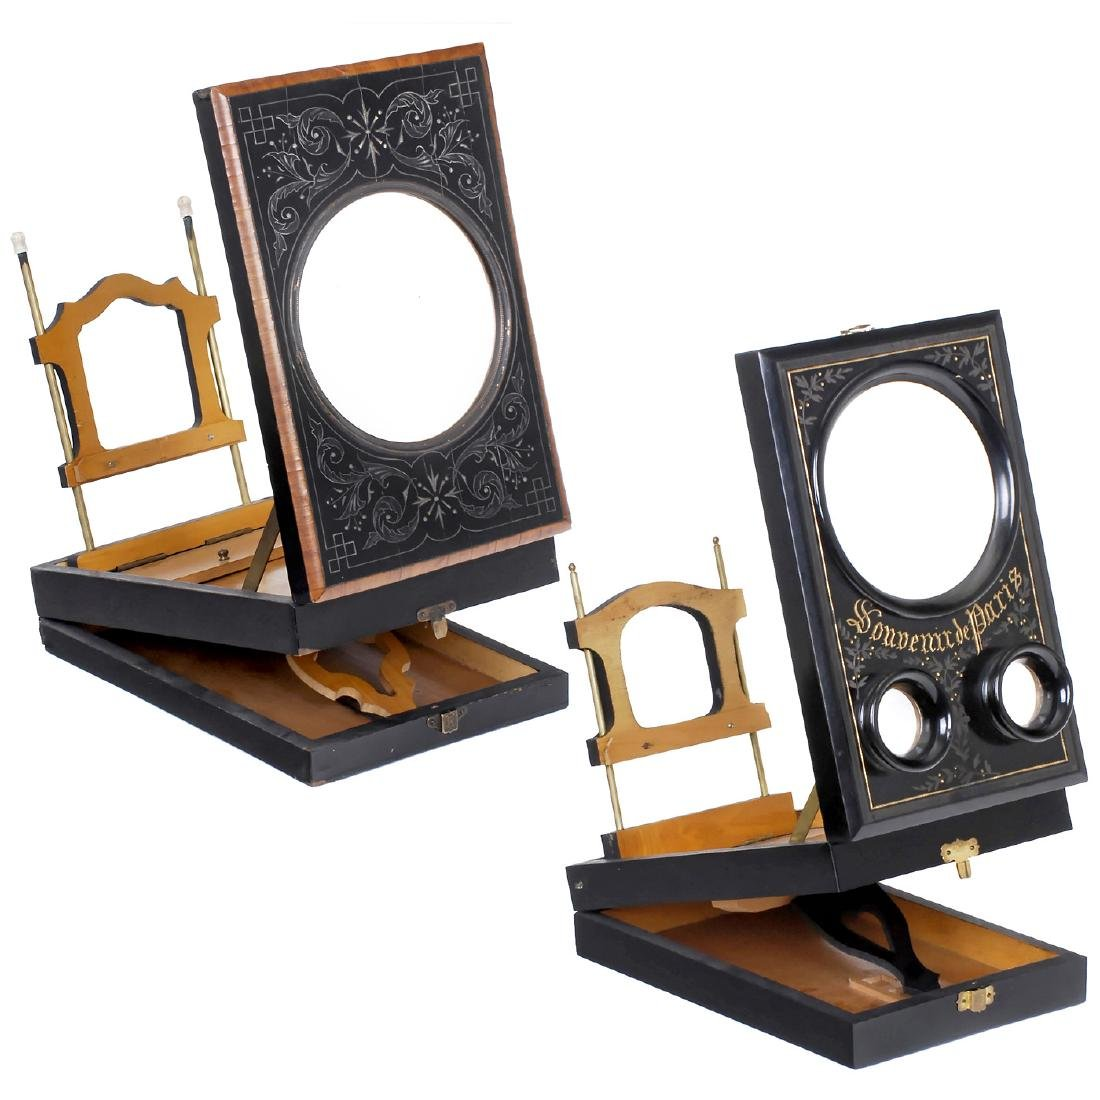 2 Graphoscopes, c. 1880